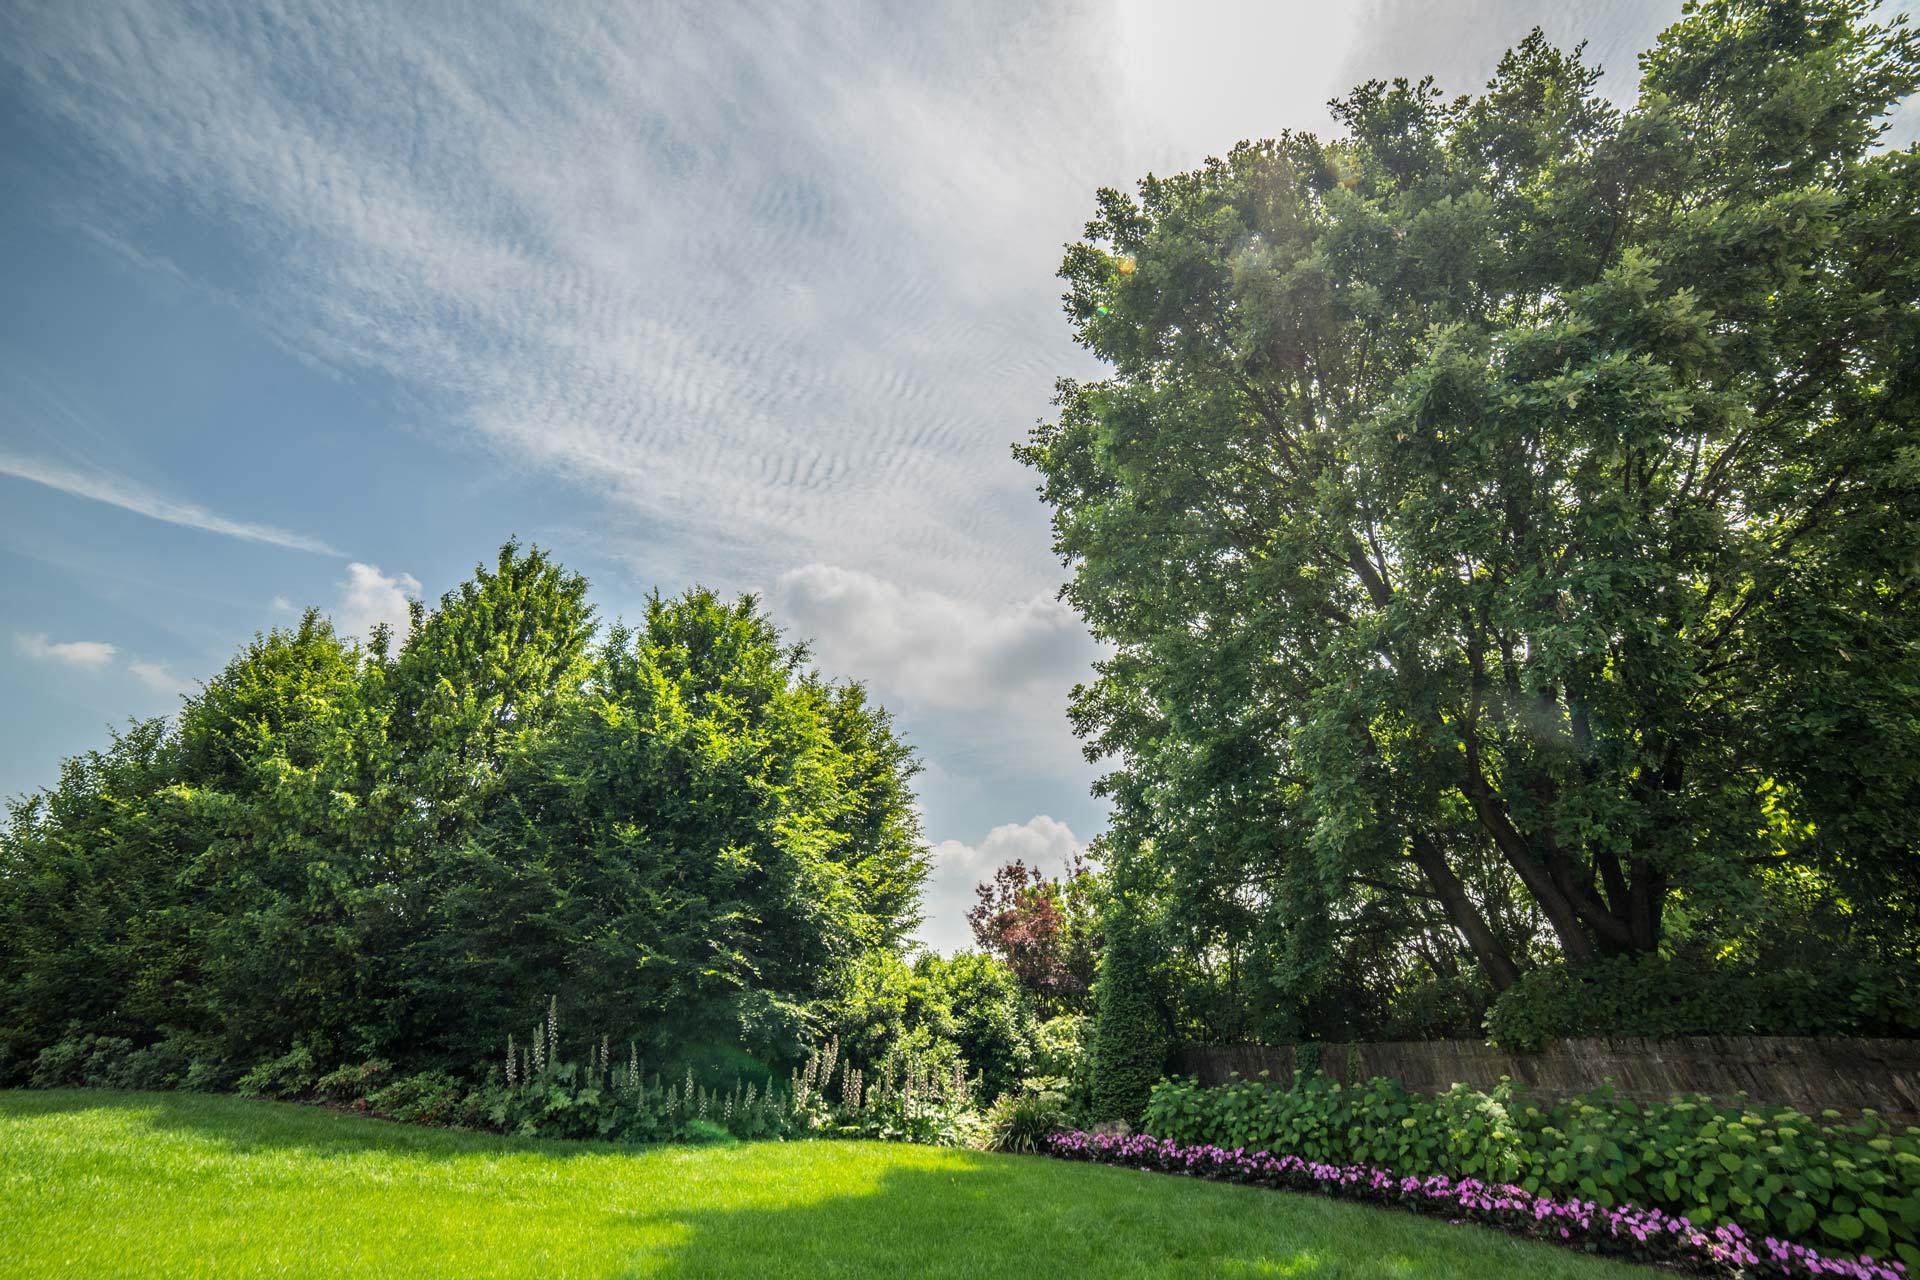 https://www.salmasogarden.it/wp-content/uploads/2020/11/foto-dettaglio-giardino-con-aiuola-2.jpg